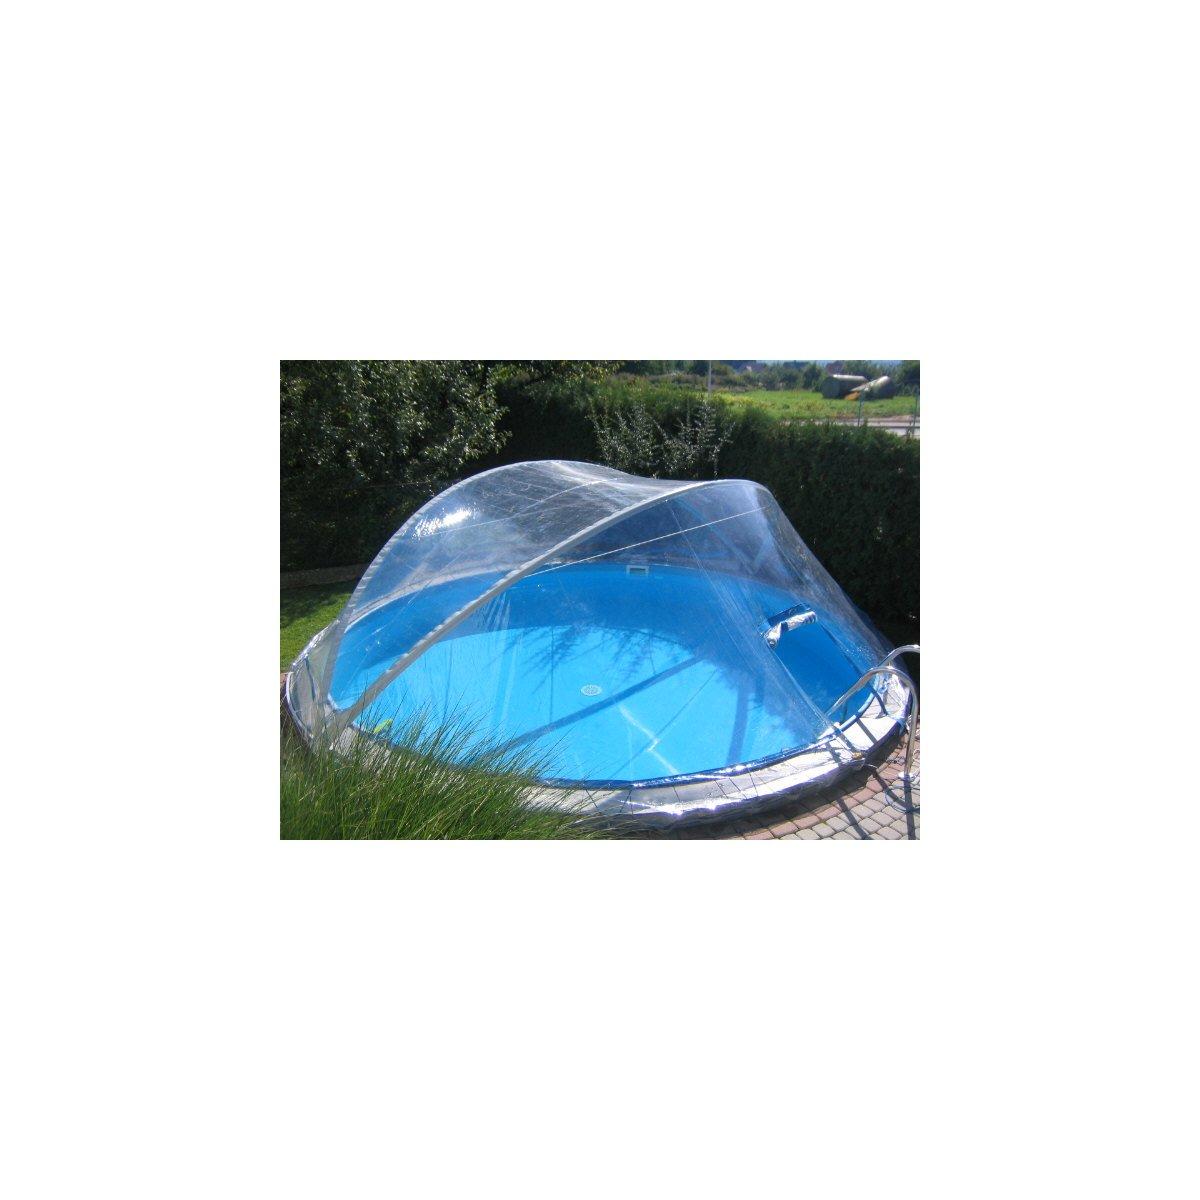 SCHWIMMBAD Pool Überdachung CABRIO DOM Rundbecken Ø 5,5 m